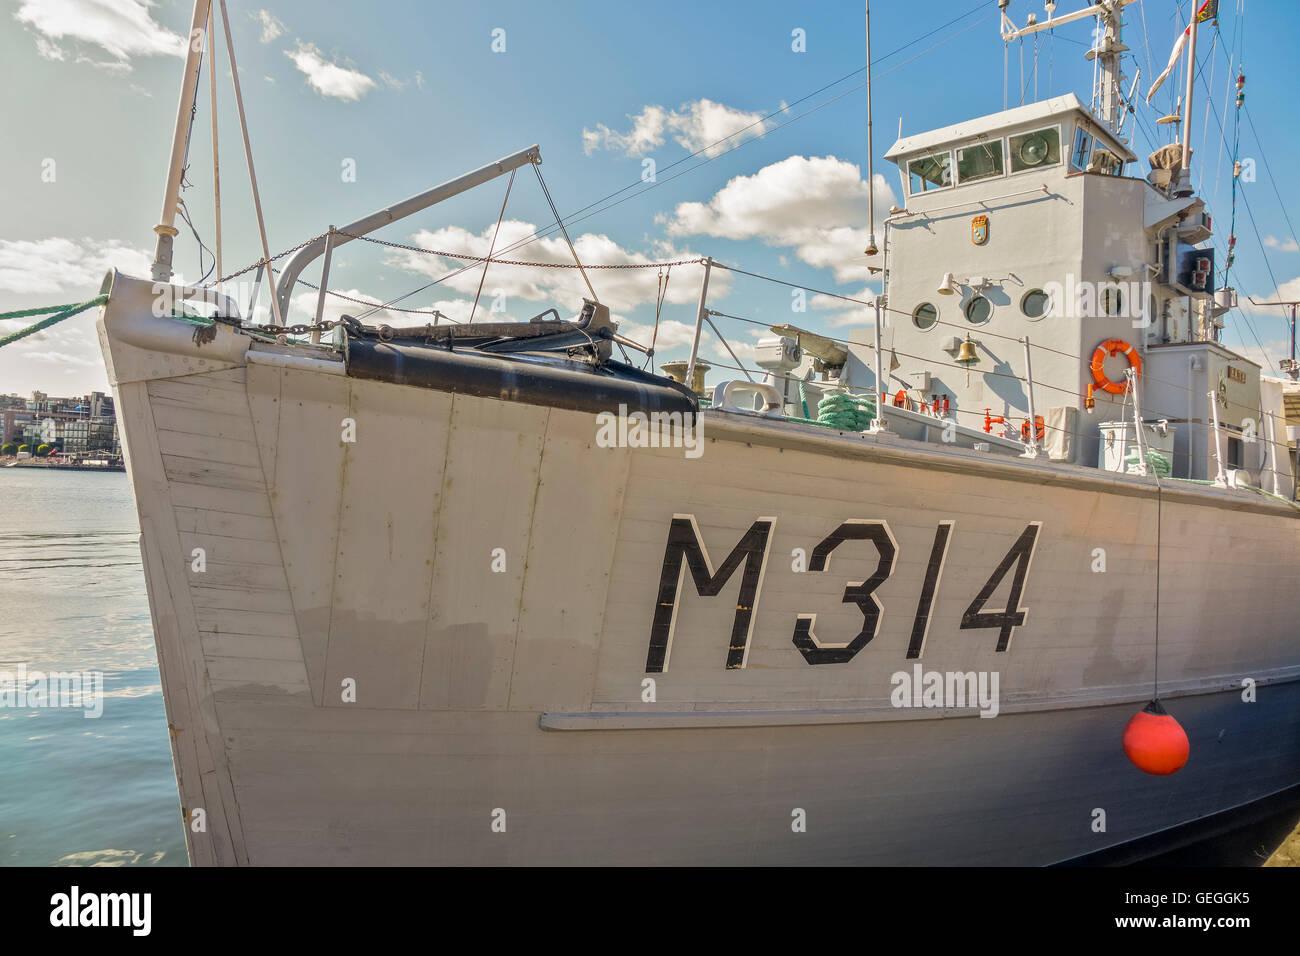 Norwegian Minesweeper M314 Oslo Harbour Norway Stock Photo